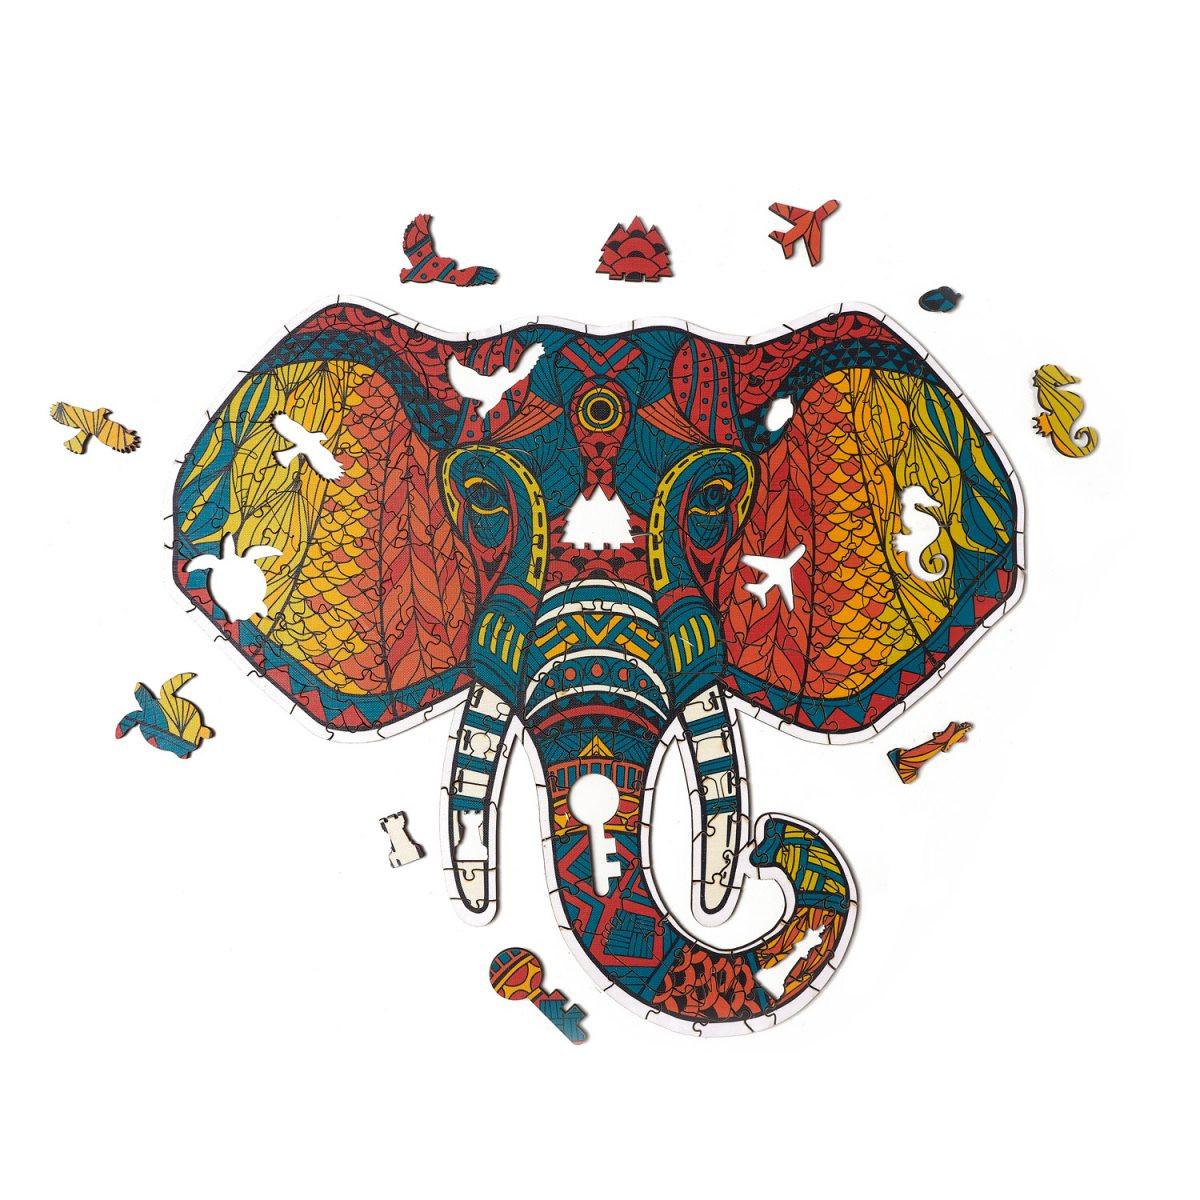 Деревянный пазл Артвентура Слон тотем, 33х29 см, 193 деталеи